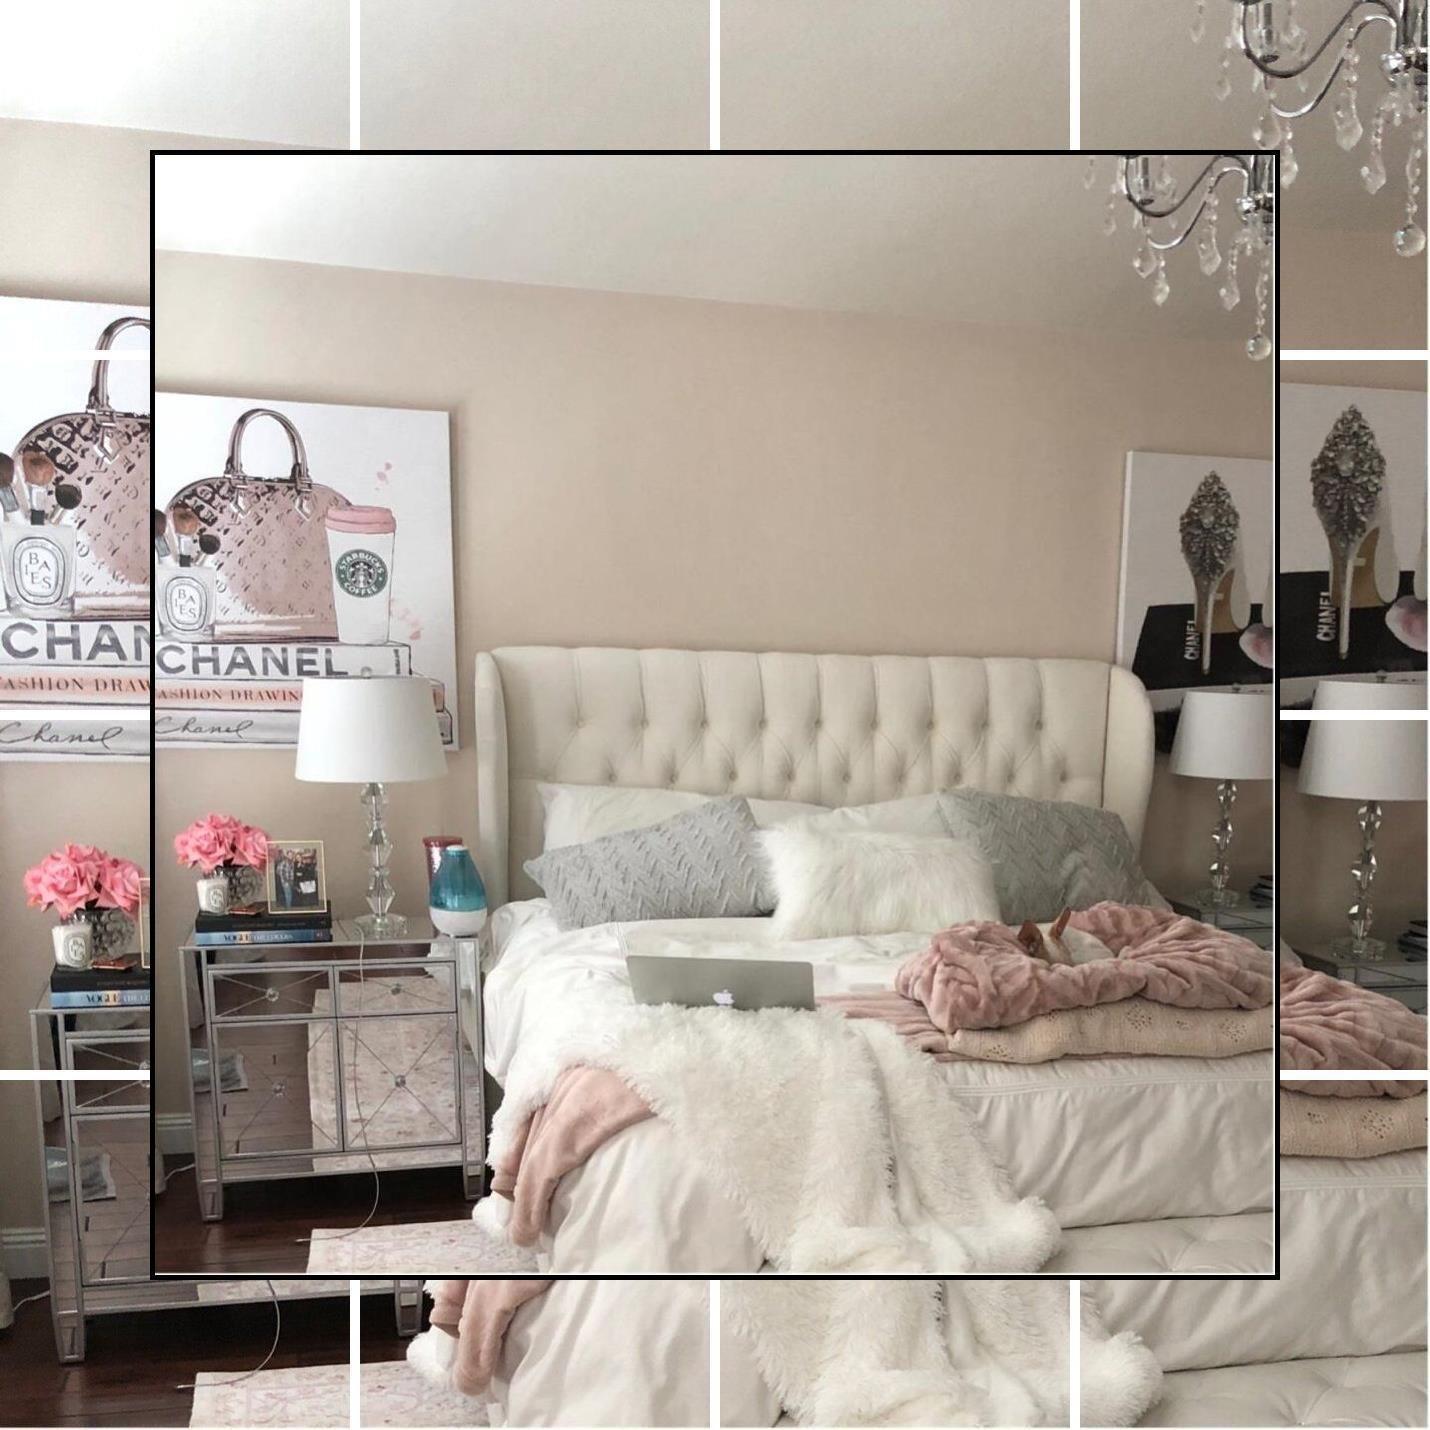 Room Designs Bedroom Home Decor Stores New Look Bedroom Ideas Home Decor Bedroom Bedroom Decor Bedroom Design